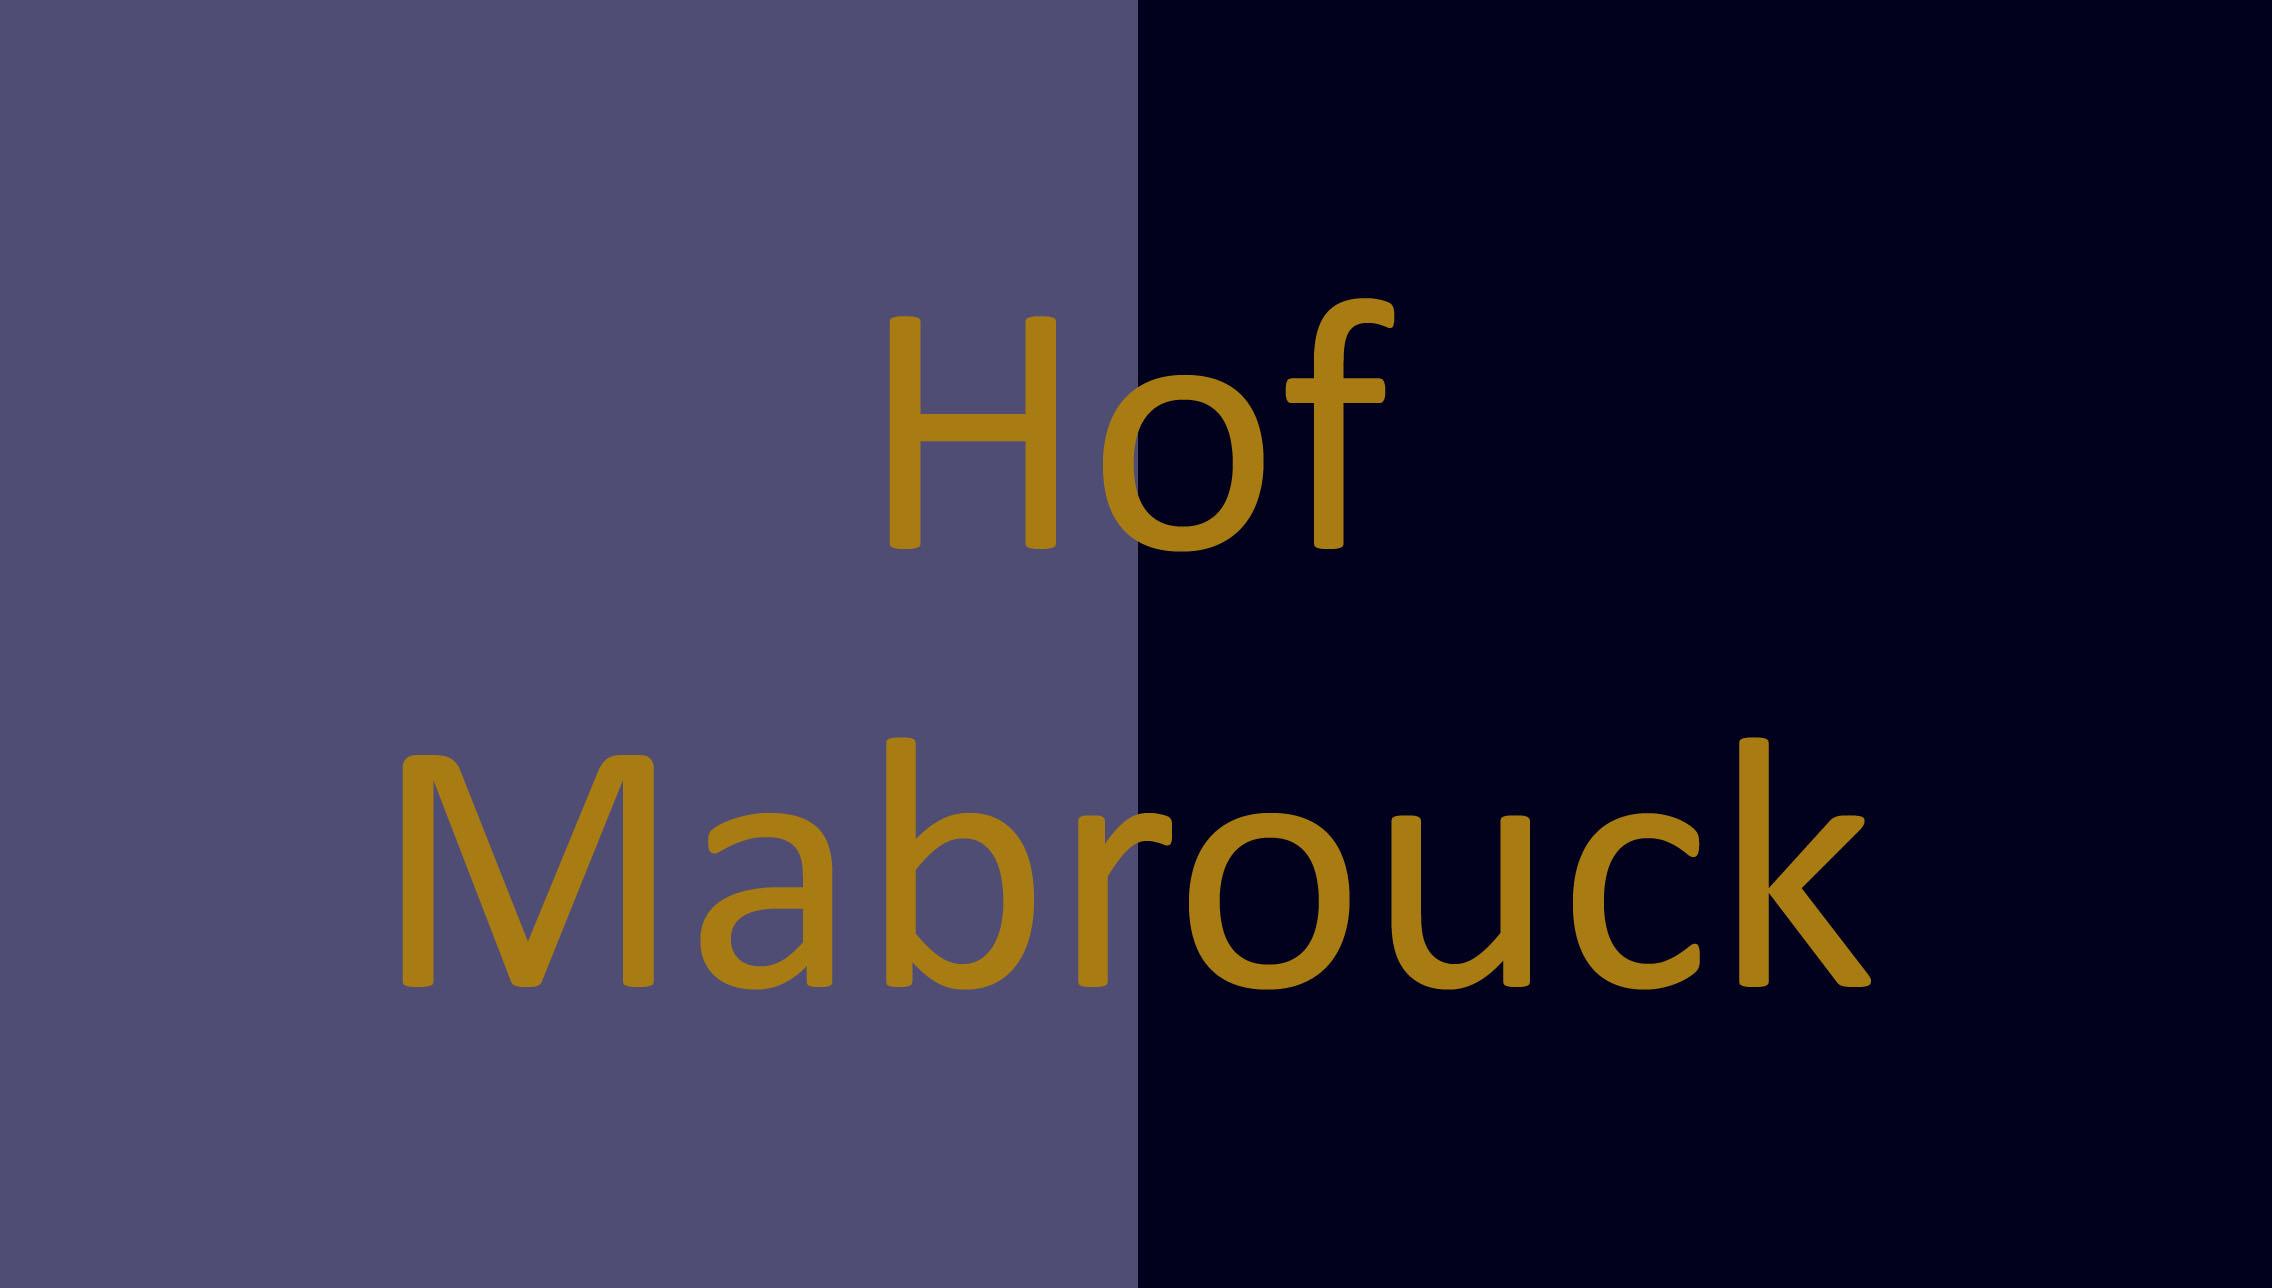 Hof Mabrouck